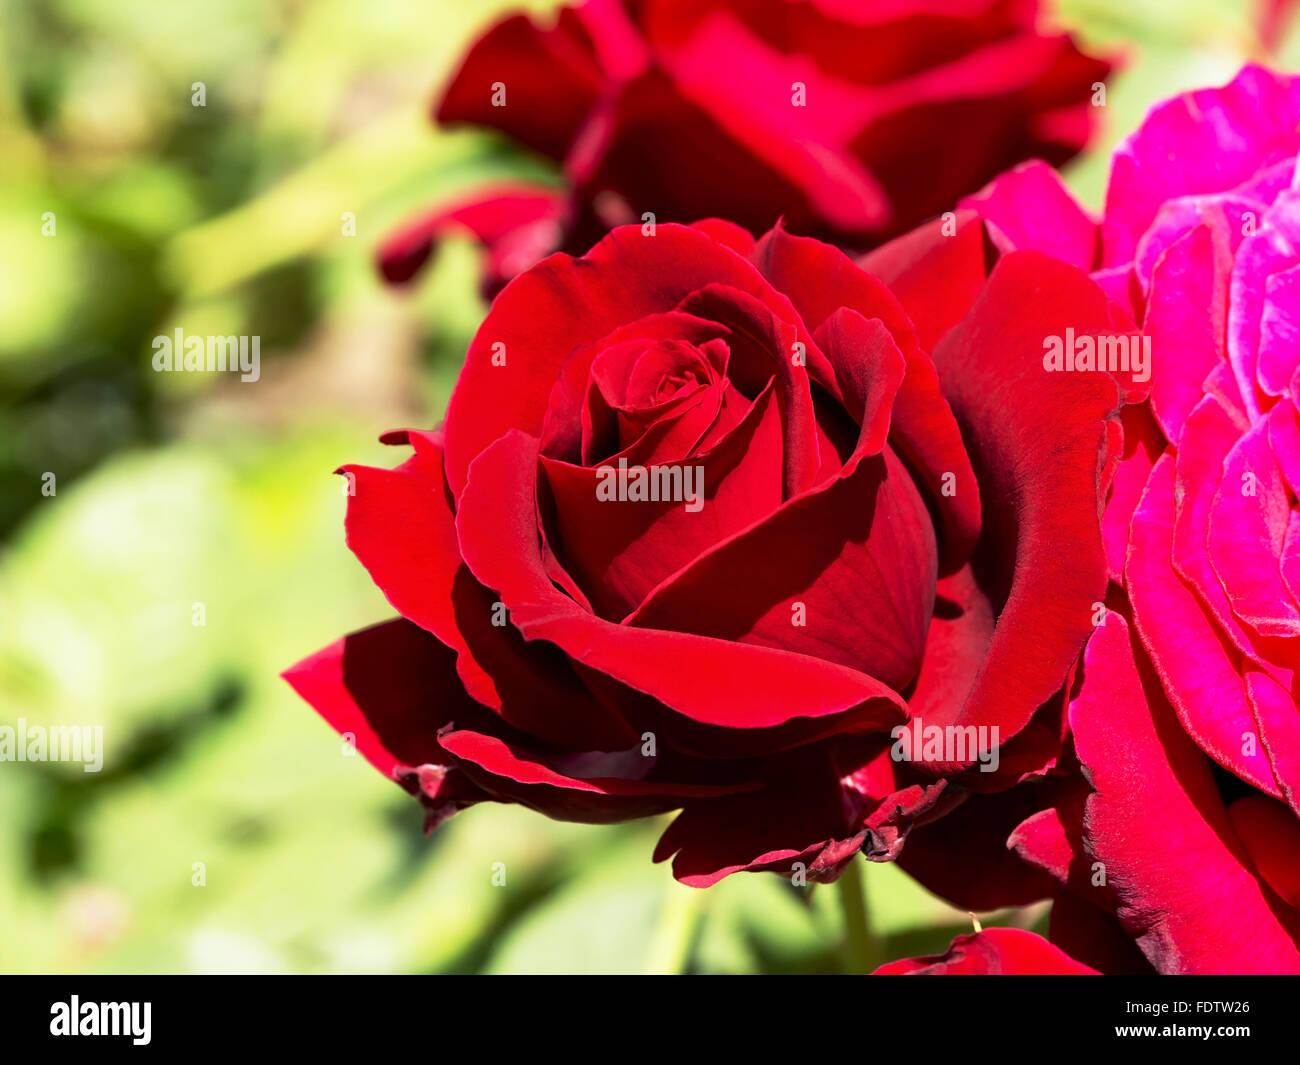 Beautiful red rose on green stock photos beautiful red rose on beautiful blooming red rose on a green background blur soft selective focus closeup image izmirmasajfo